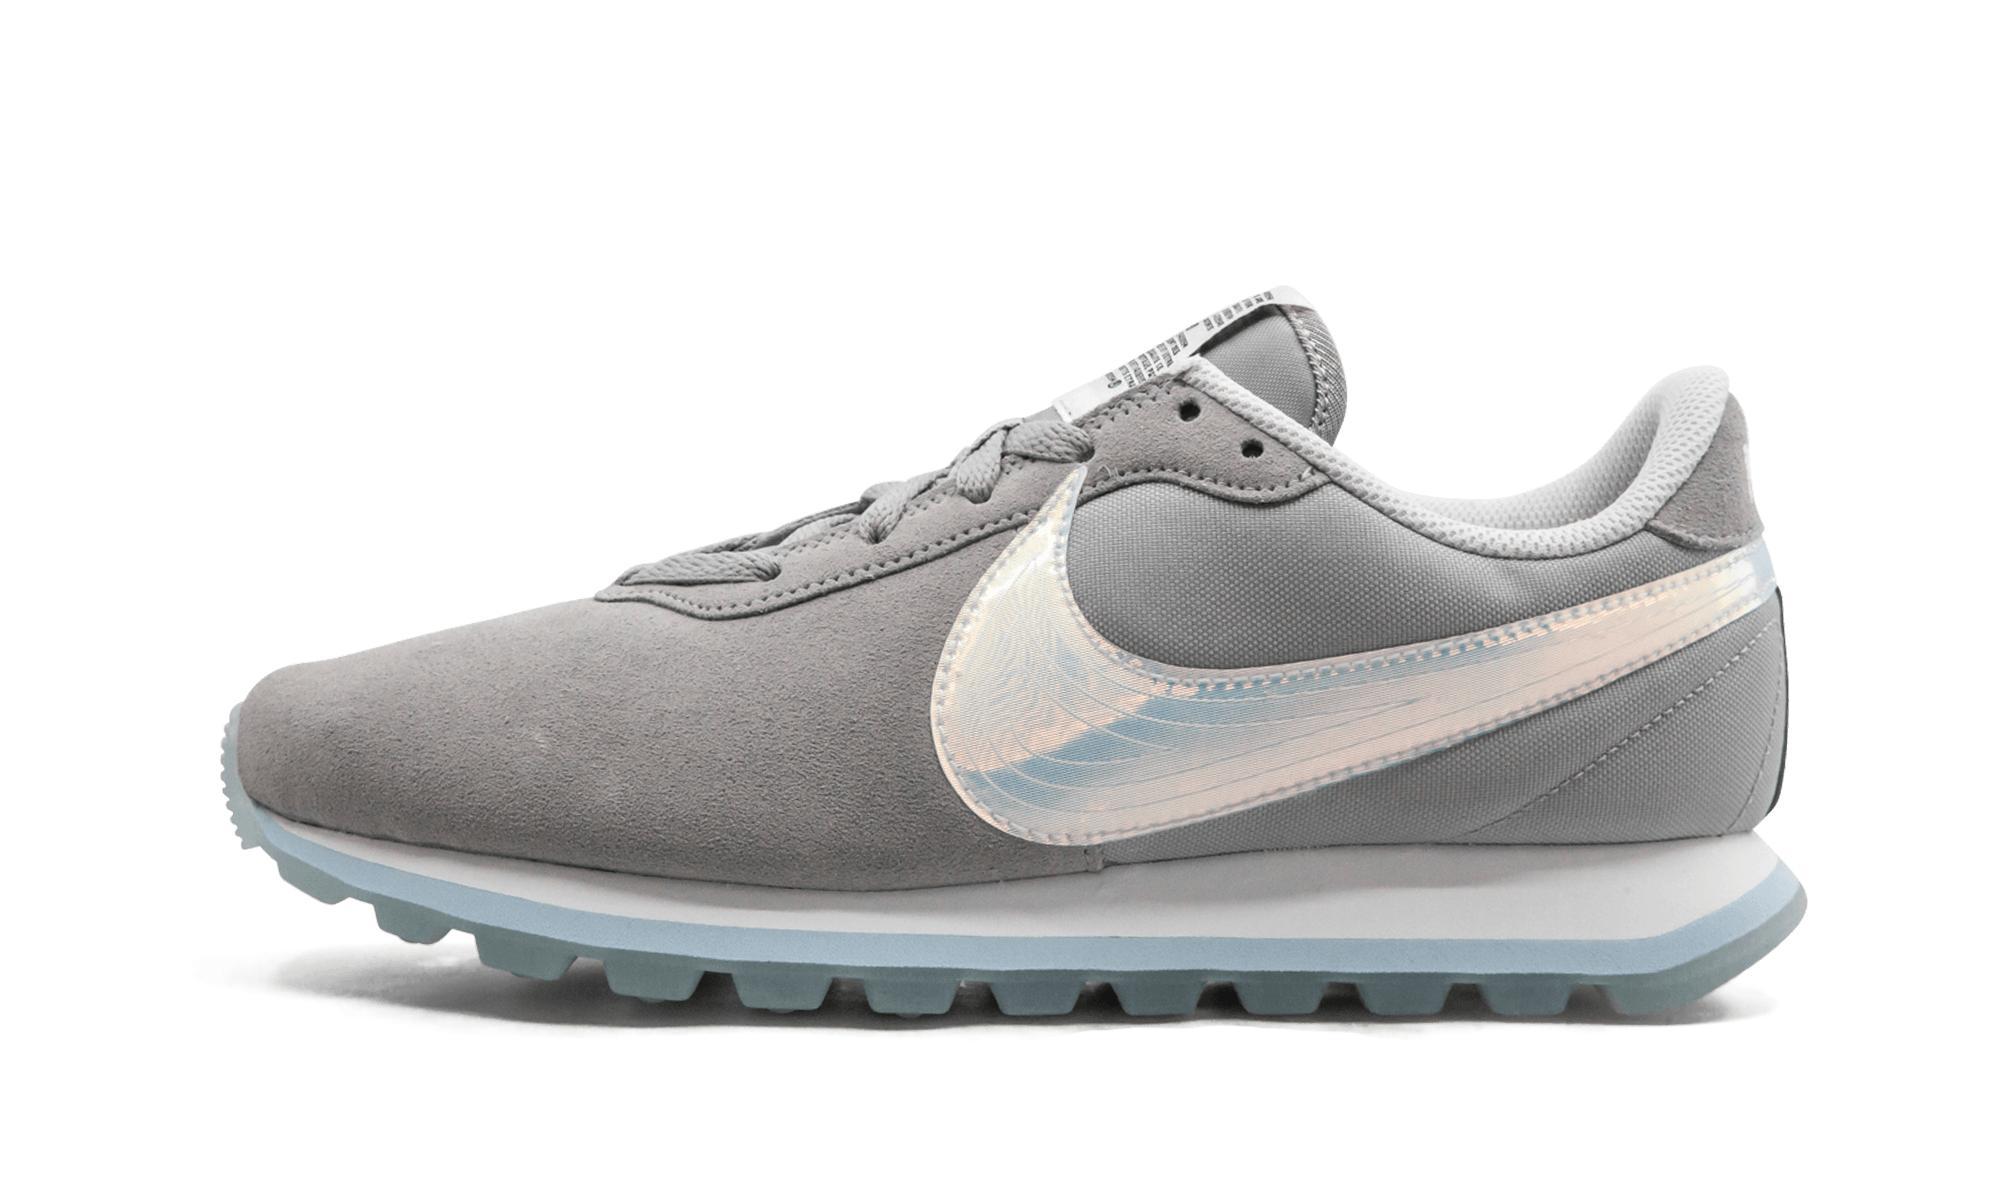 331bb36b9468 Lyst - Nike W Pre-love O.x. in Gray